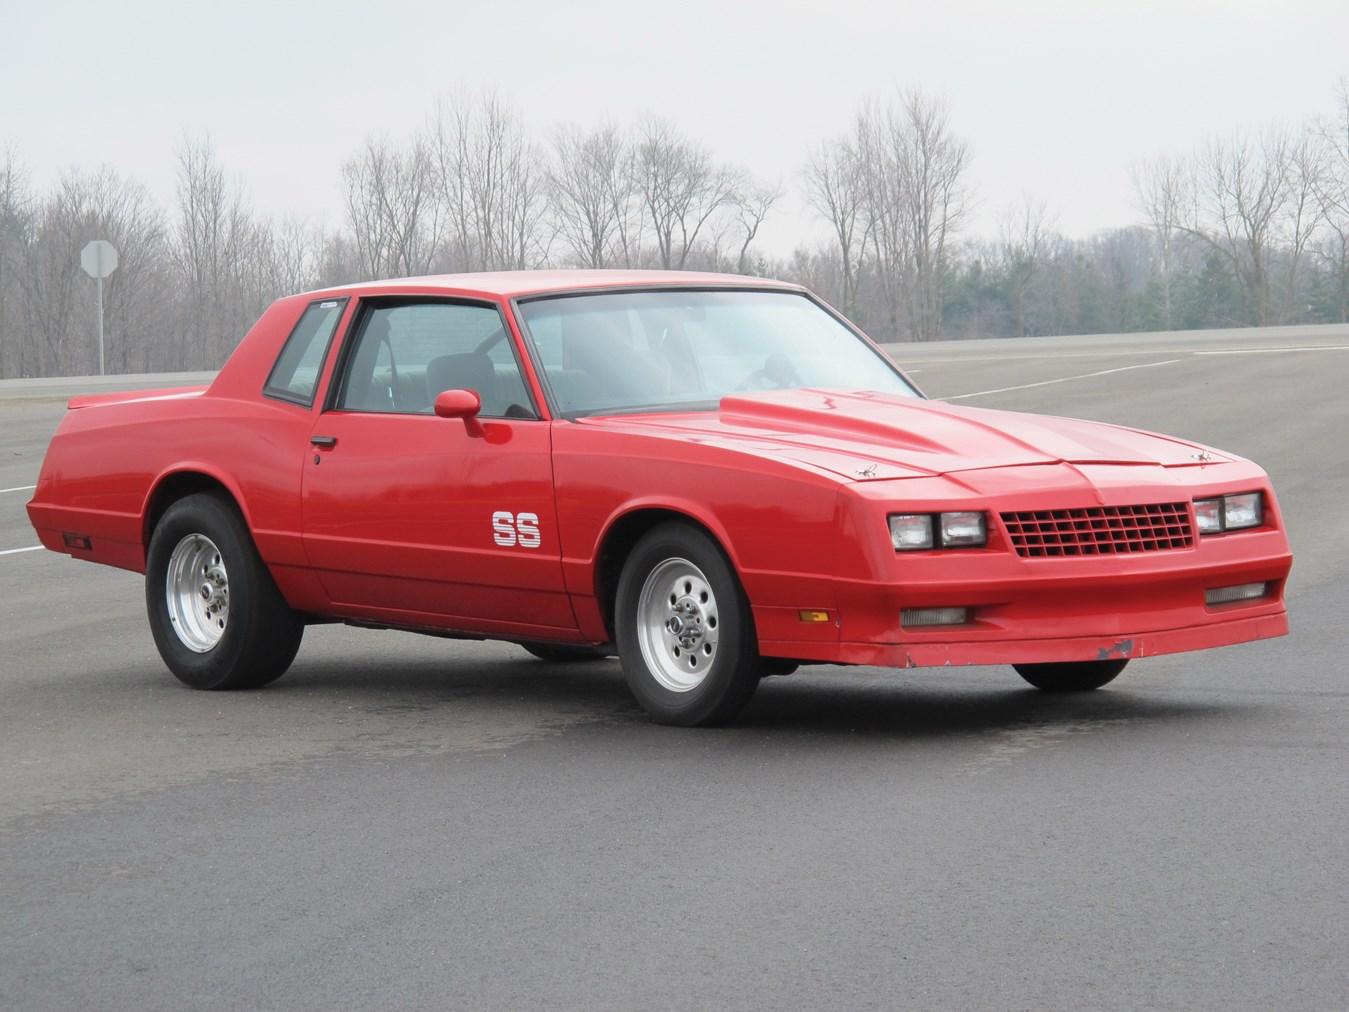 RM Sotheby\'s - 1983 Chevrolet Monte Carlo Drag Car   Auburn Spring 2011